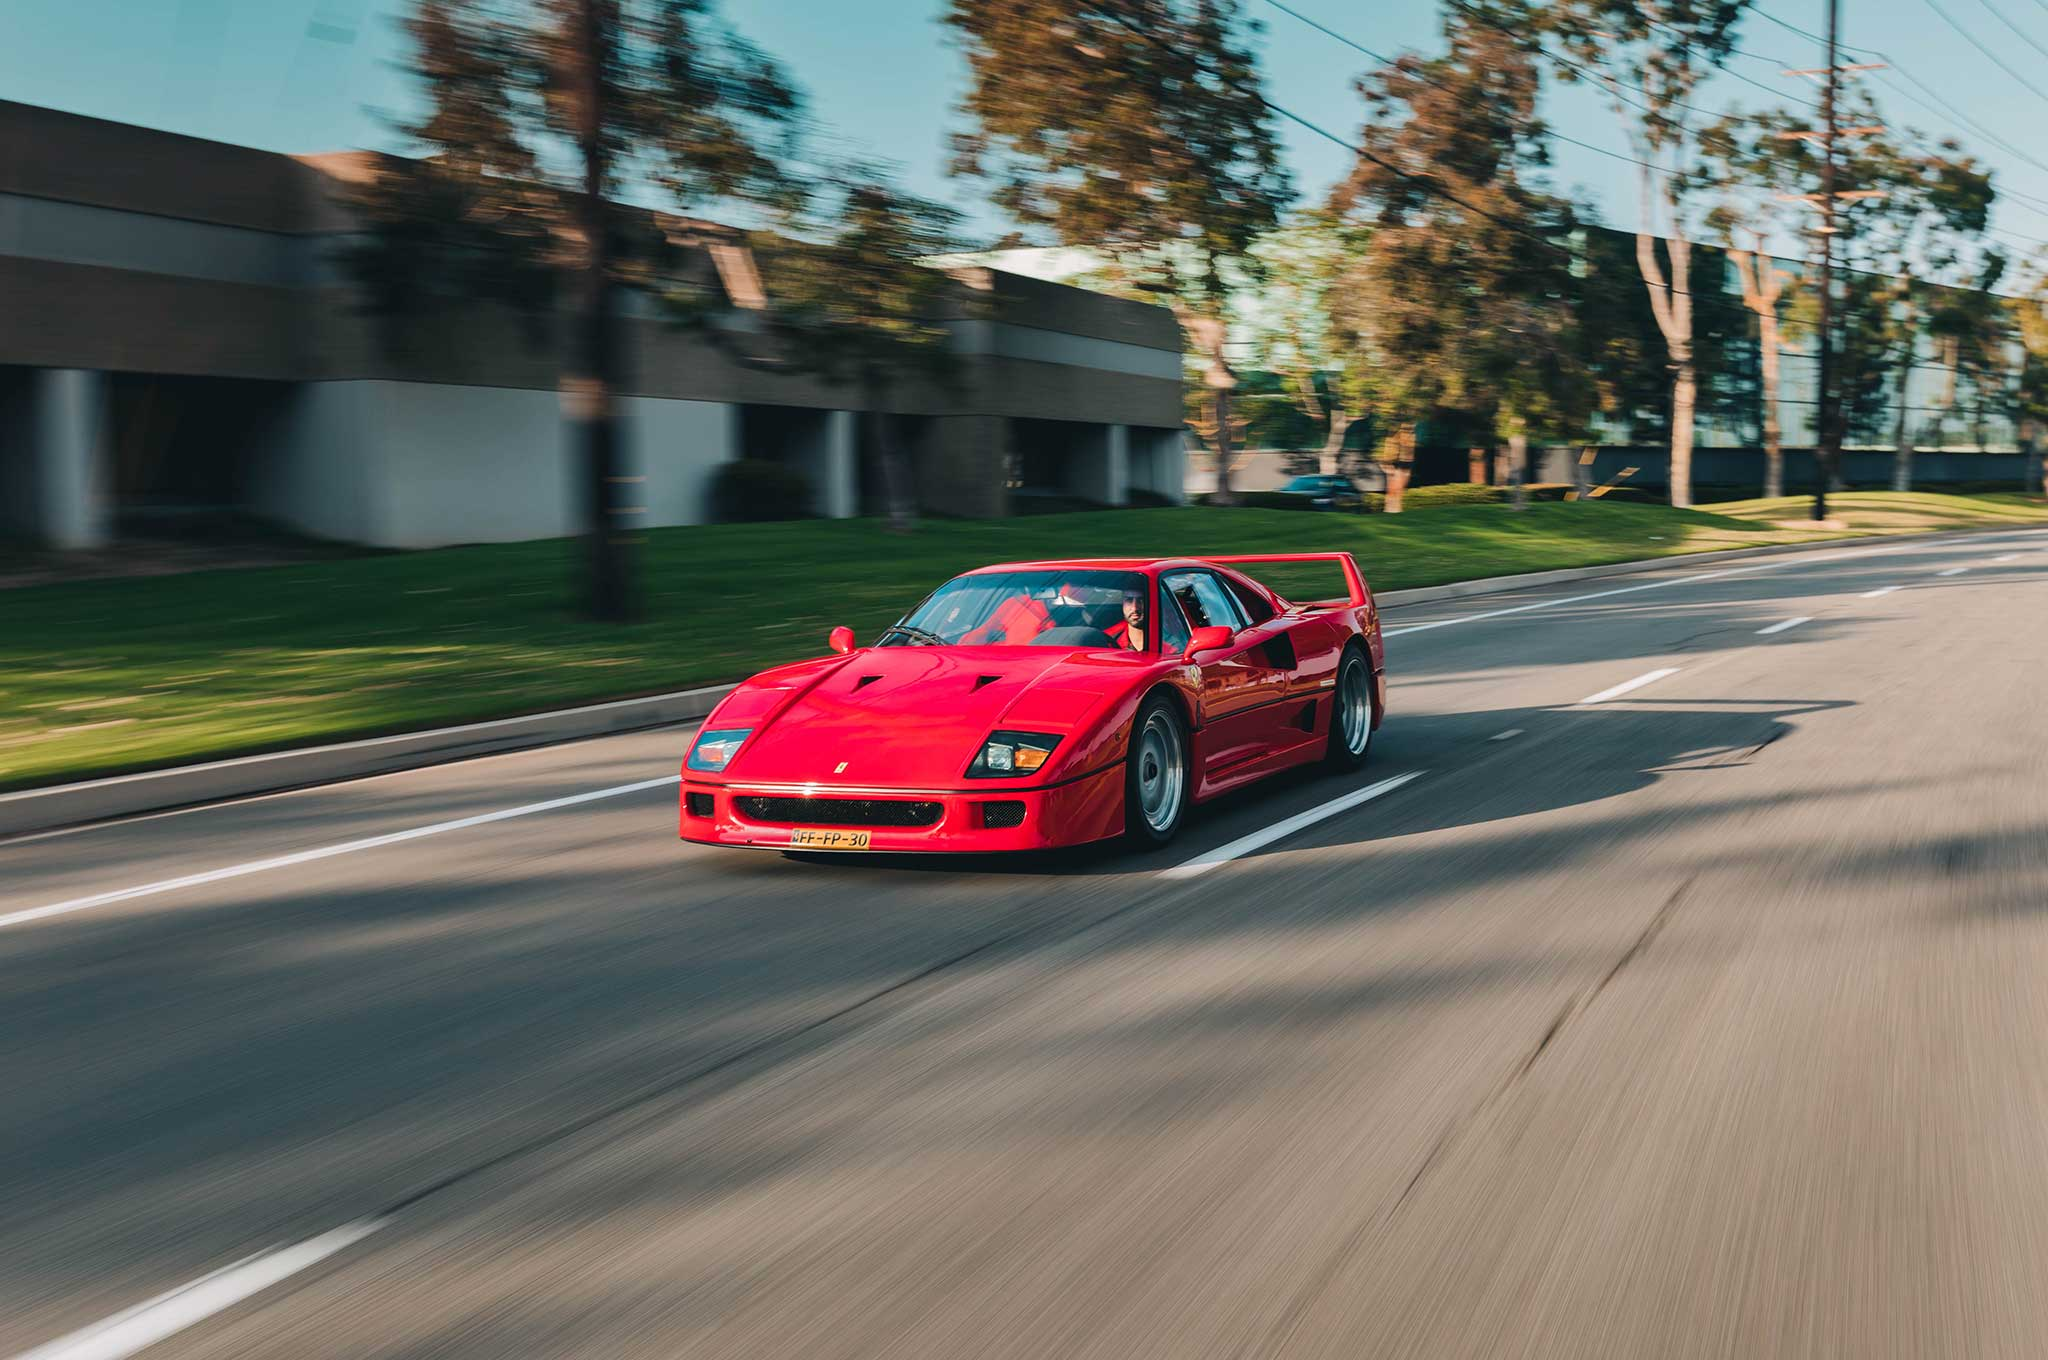 Ferrari F40 Exhaust